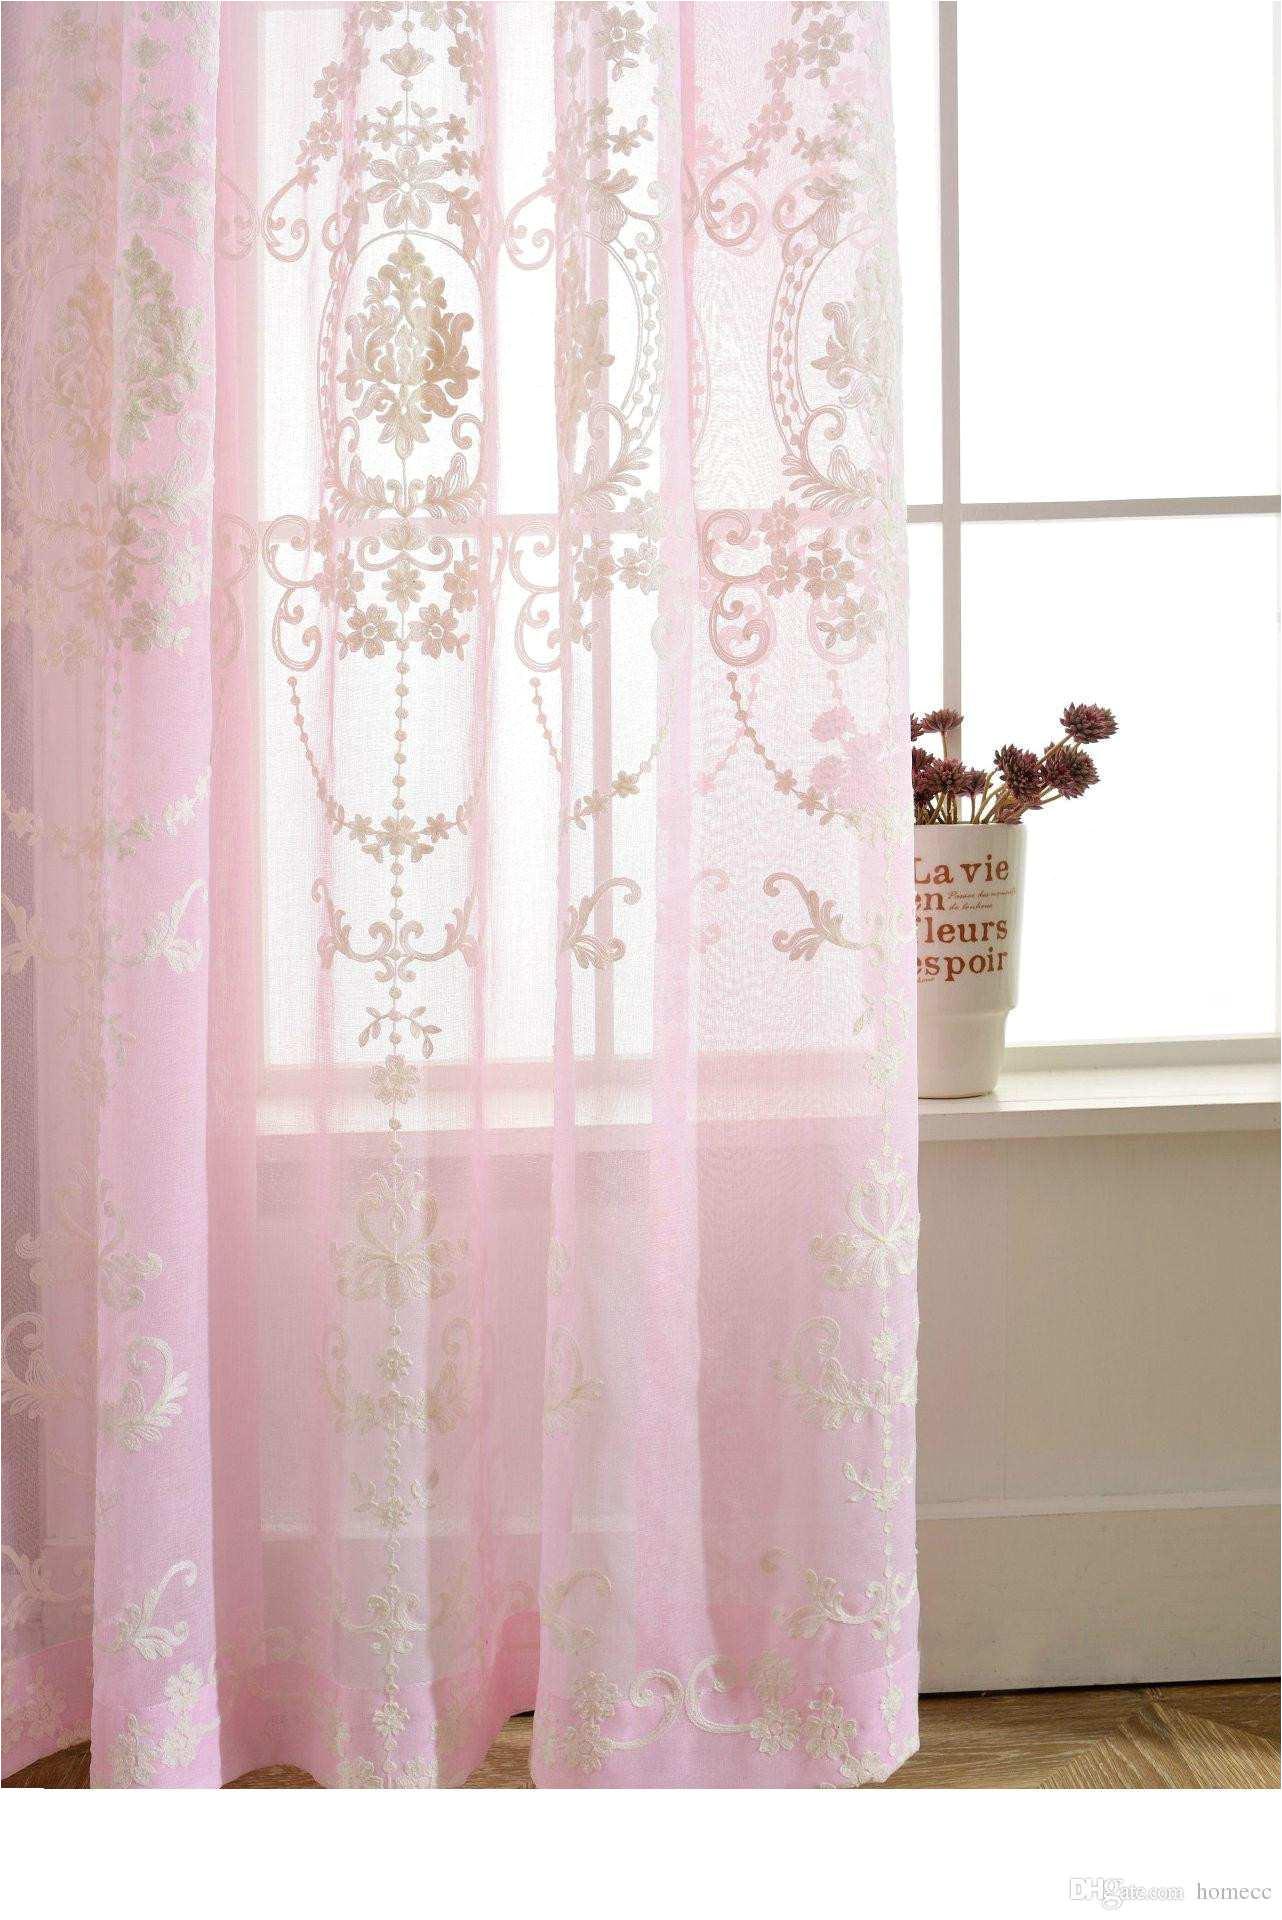 cortinas retro encantador wohnzimmer vorhange minimalist homeautodesign of cortinas retro elegante stylowy okap dla mia